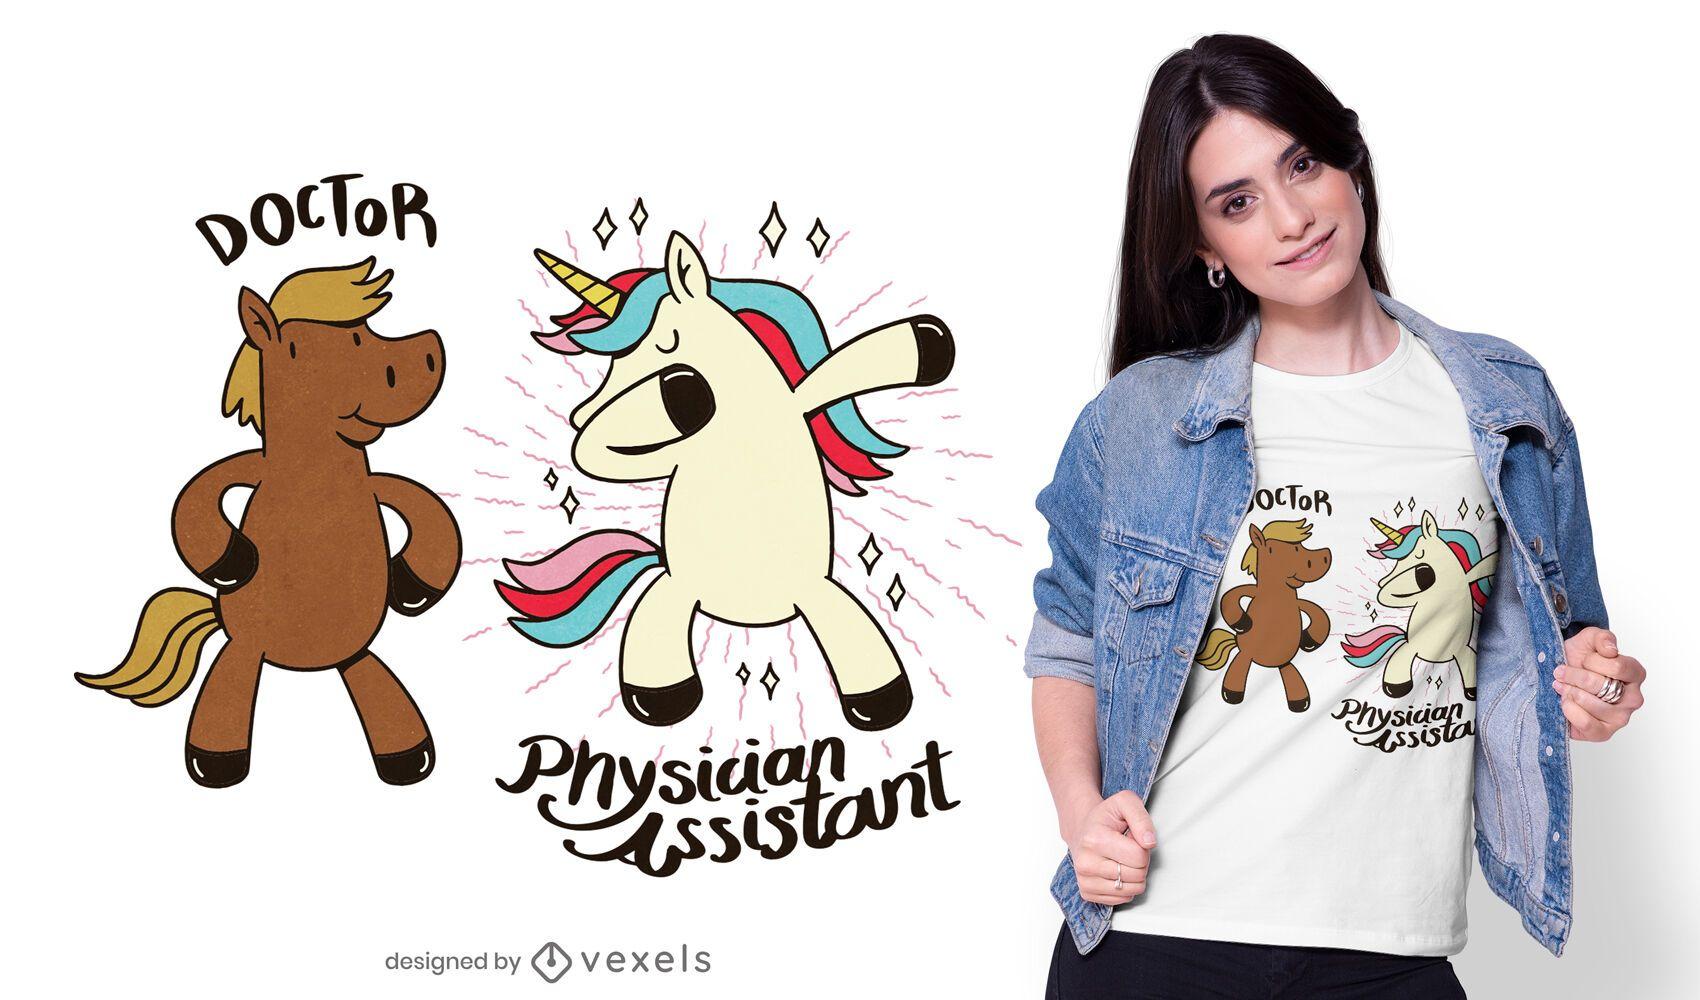 Physician assistant t-shirt design